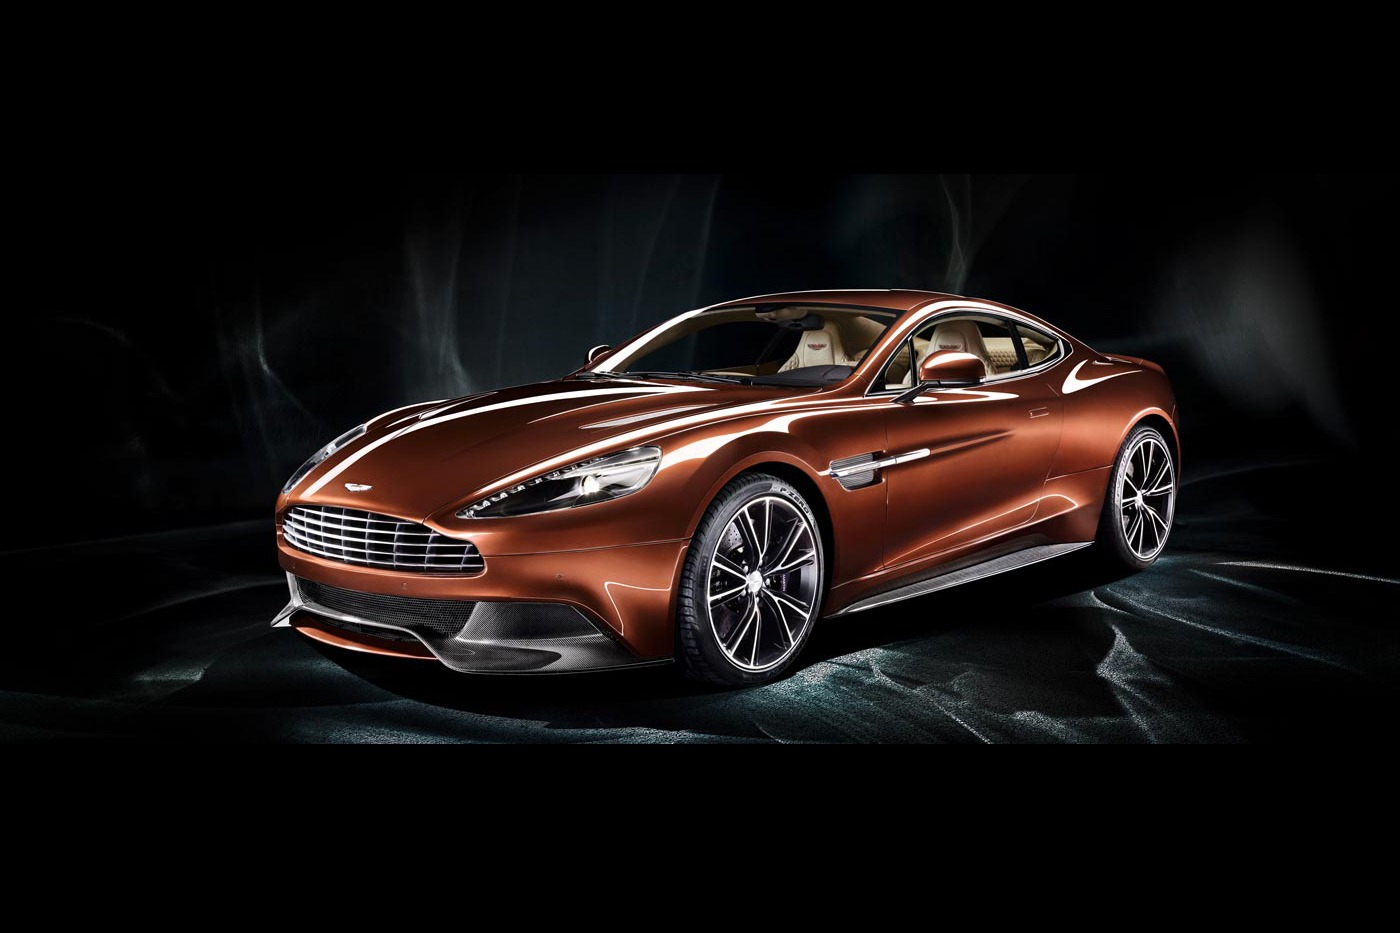 2016 Ford Gt Top Speed >> ASTON MARTIN Vanquish specs - 2012, 2013, 2014, 2015, 2016 ...